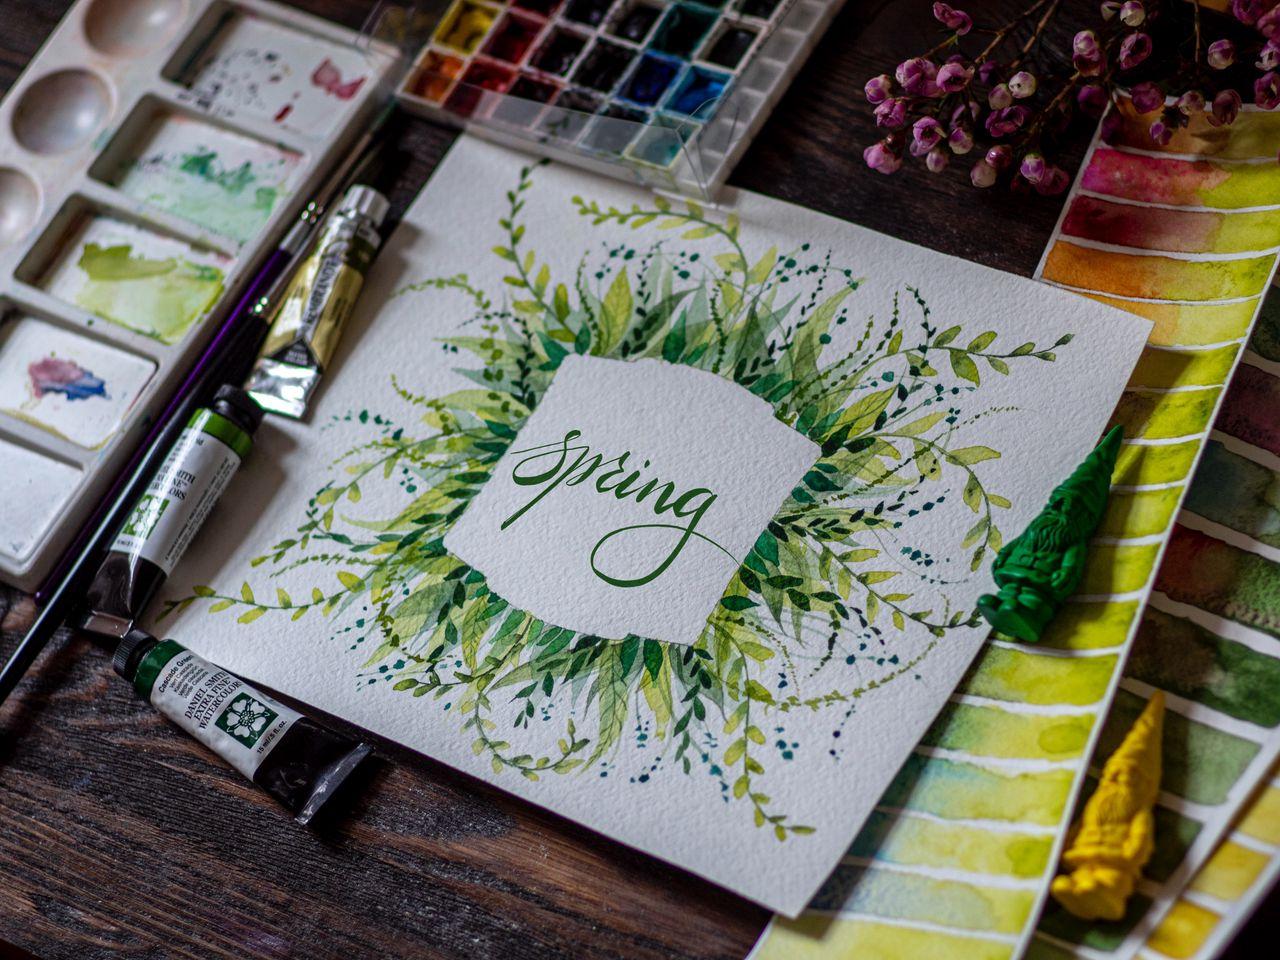 1280x960 Обои весна, слово, леттеринг, краски, акварель